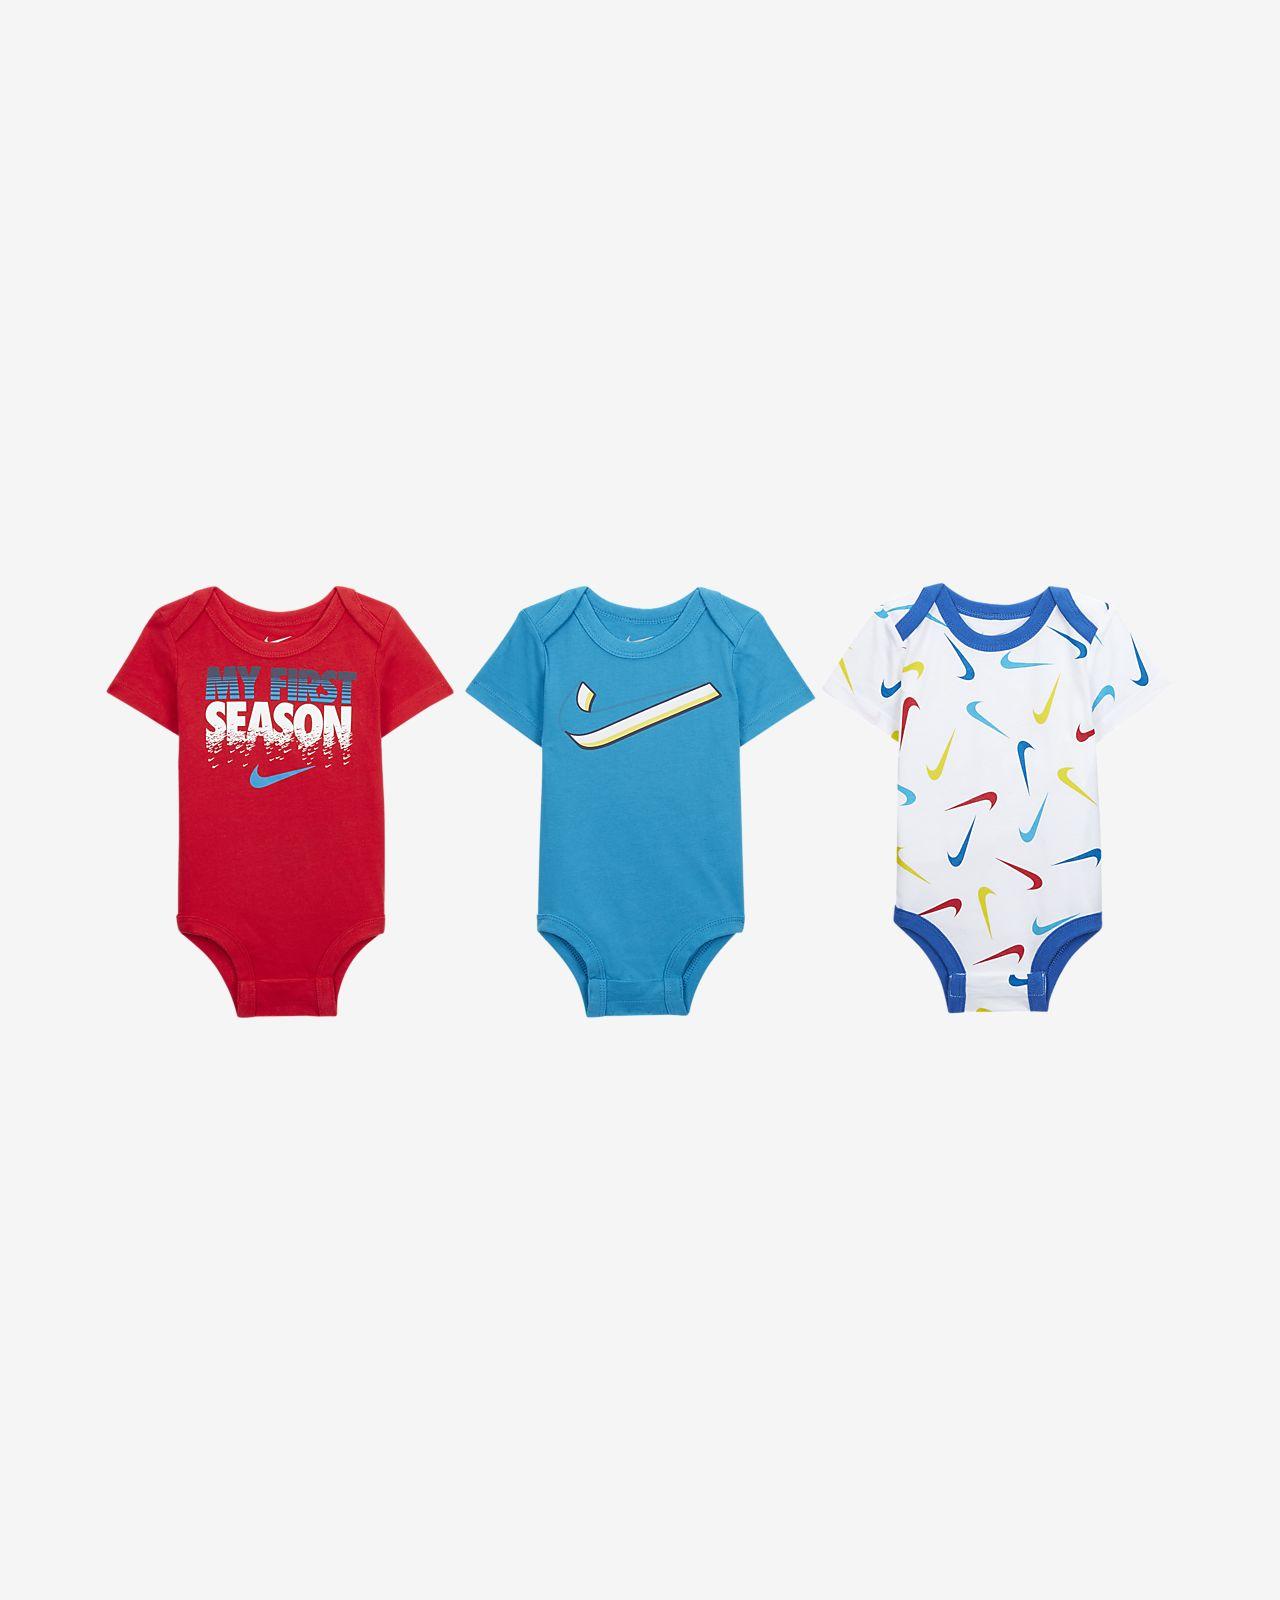 Scuba Diver Bubbles Baby Girls Short Sleeve Ruffles T-Shirt Tops 2-Pack Cotton Tee